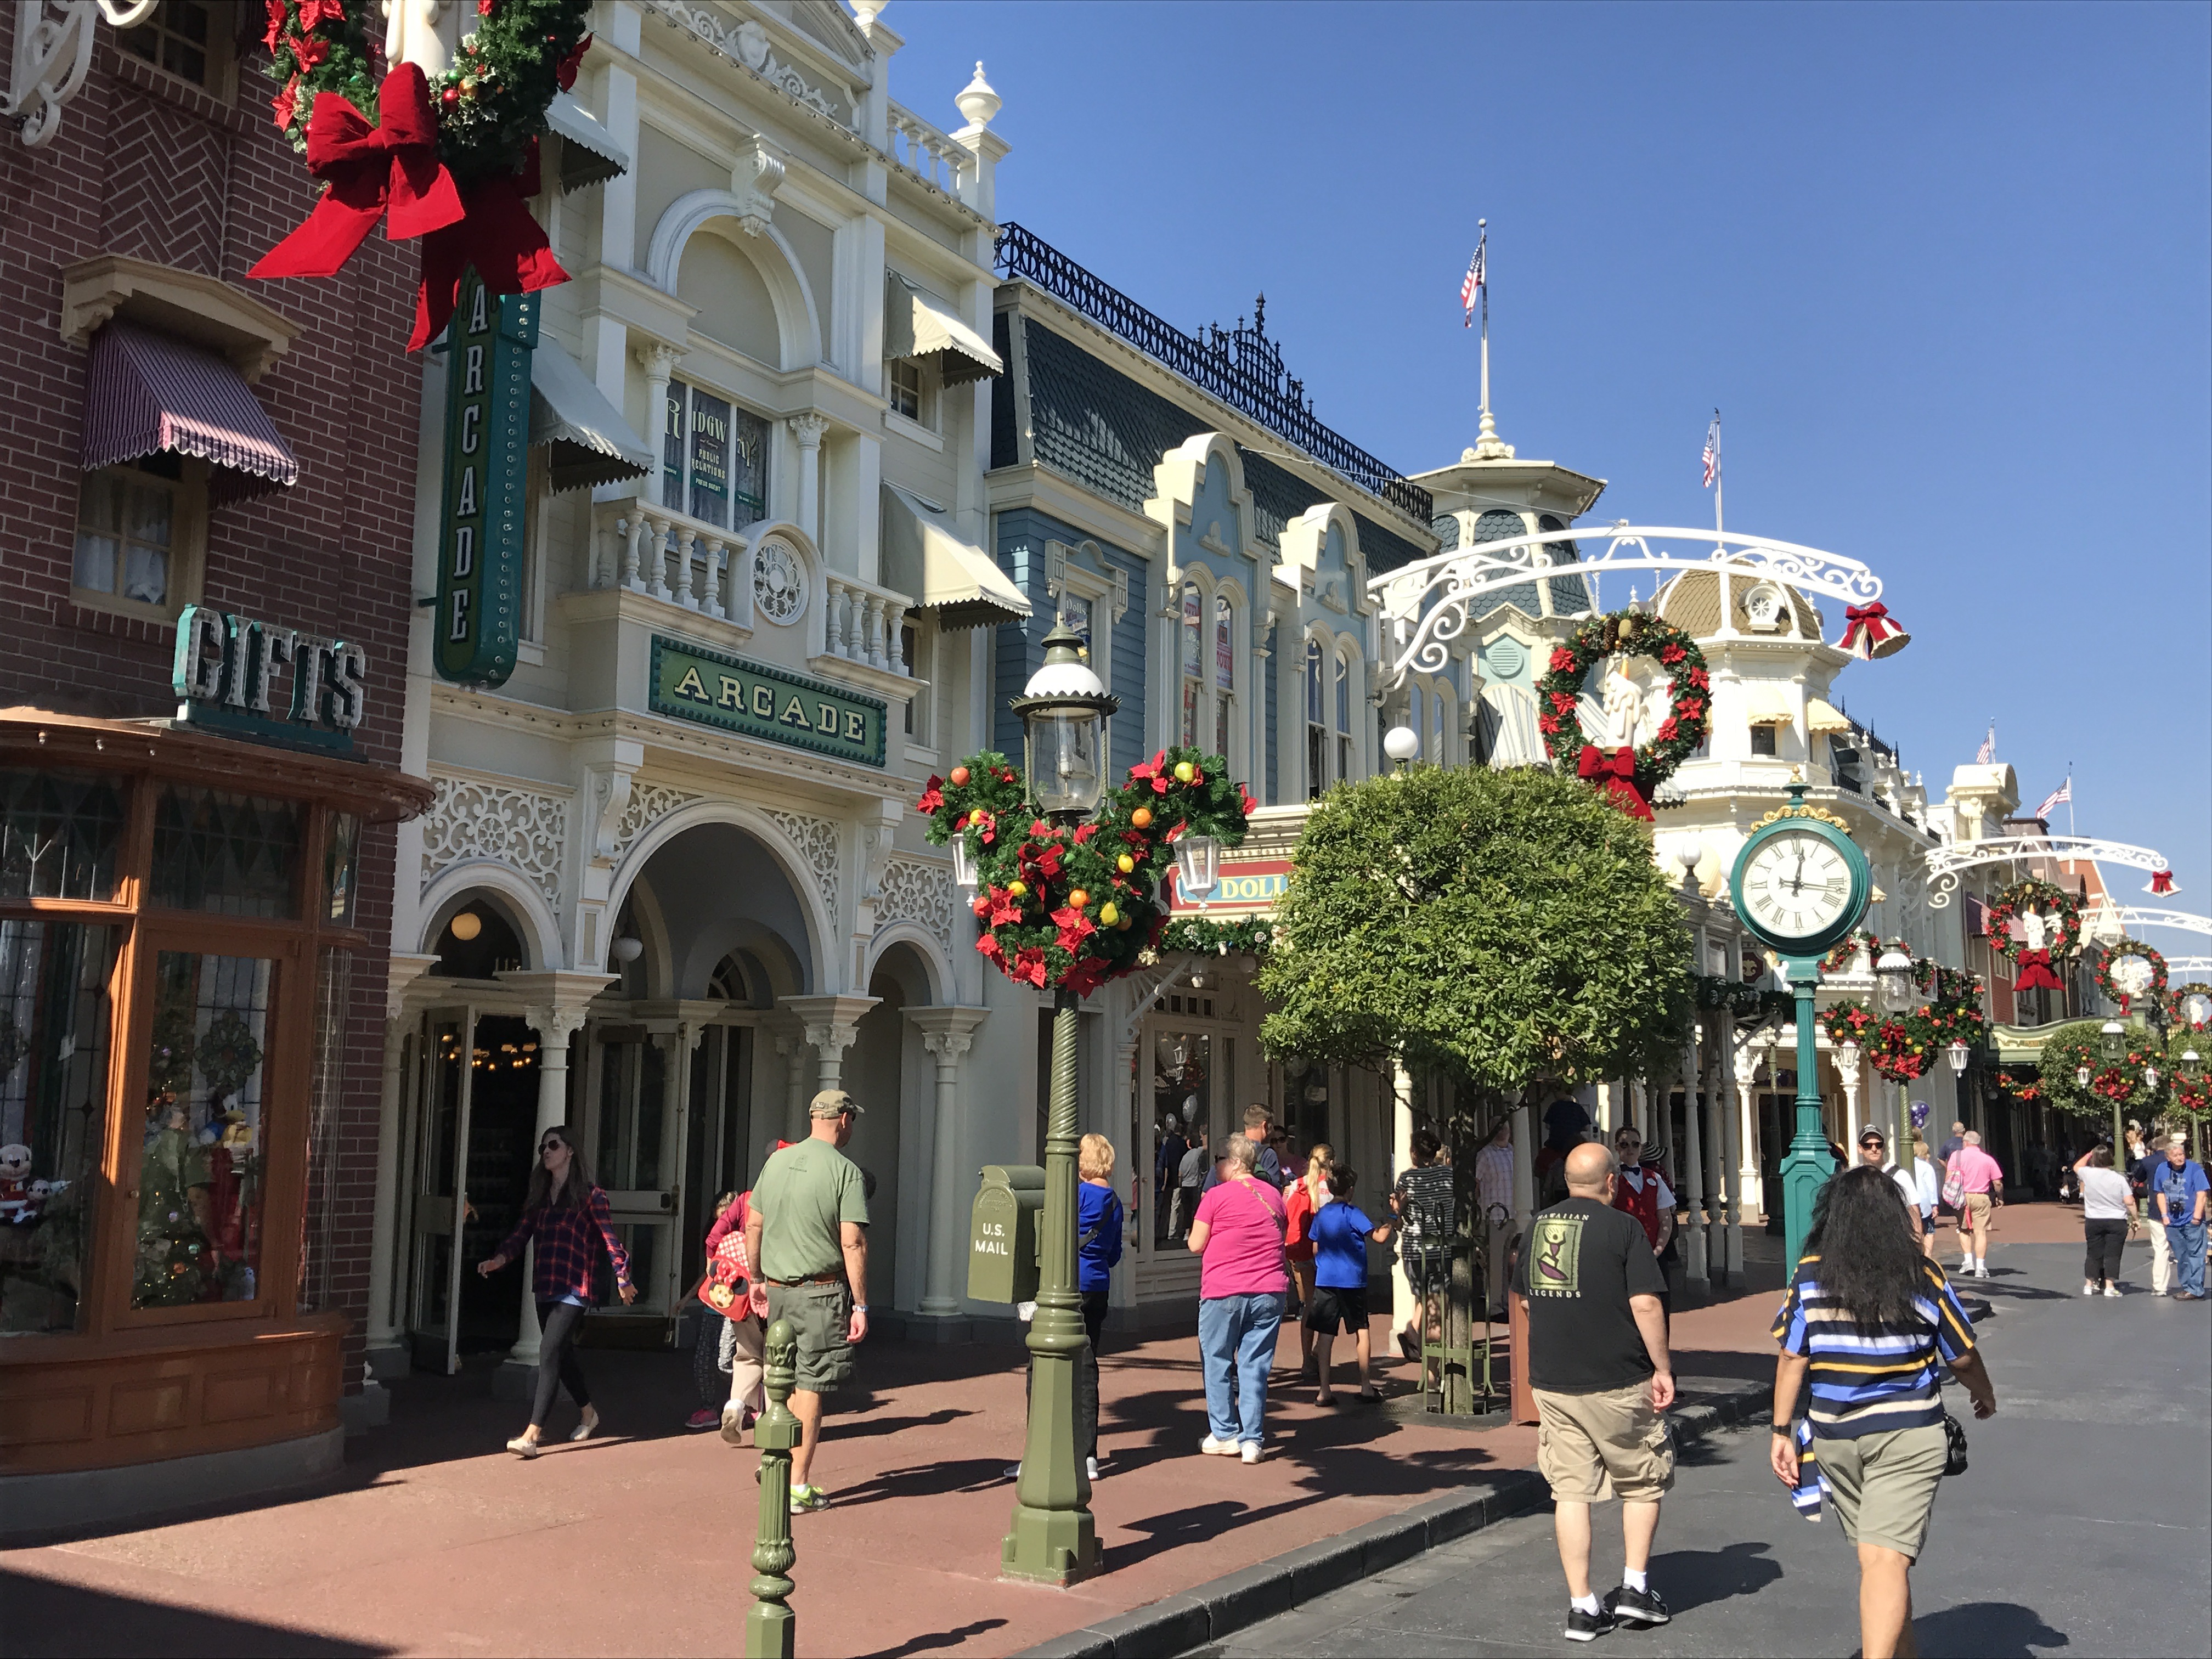 Christmas Decorations On Main Street U.S.A.